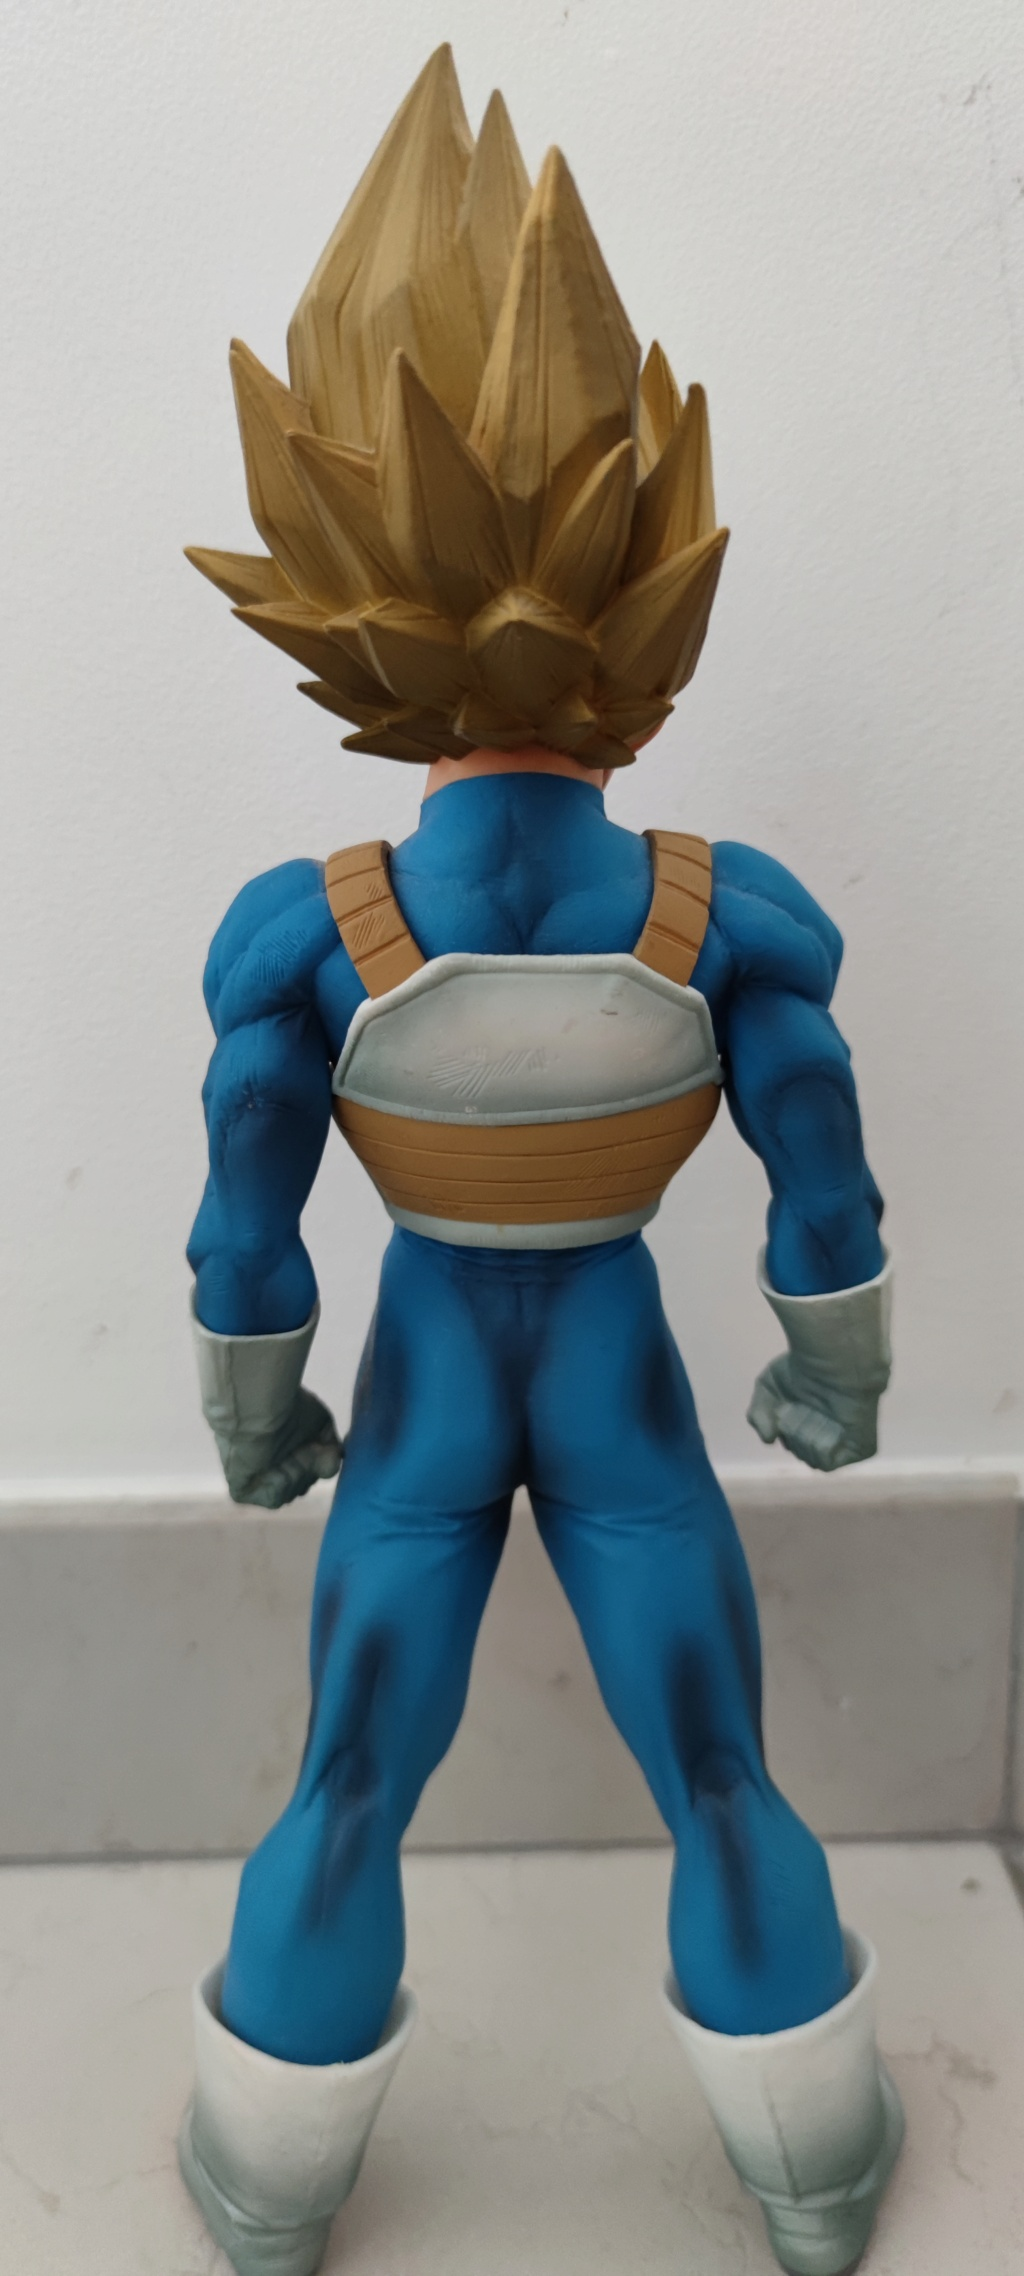 [VDS] Figurines Dragon Ball, One piece, Naruto, Megaman etc....  16162429